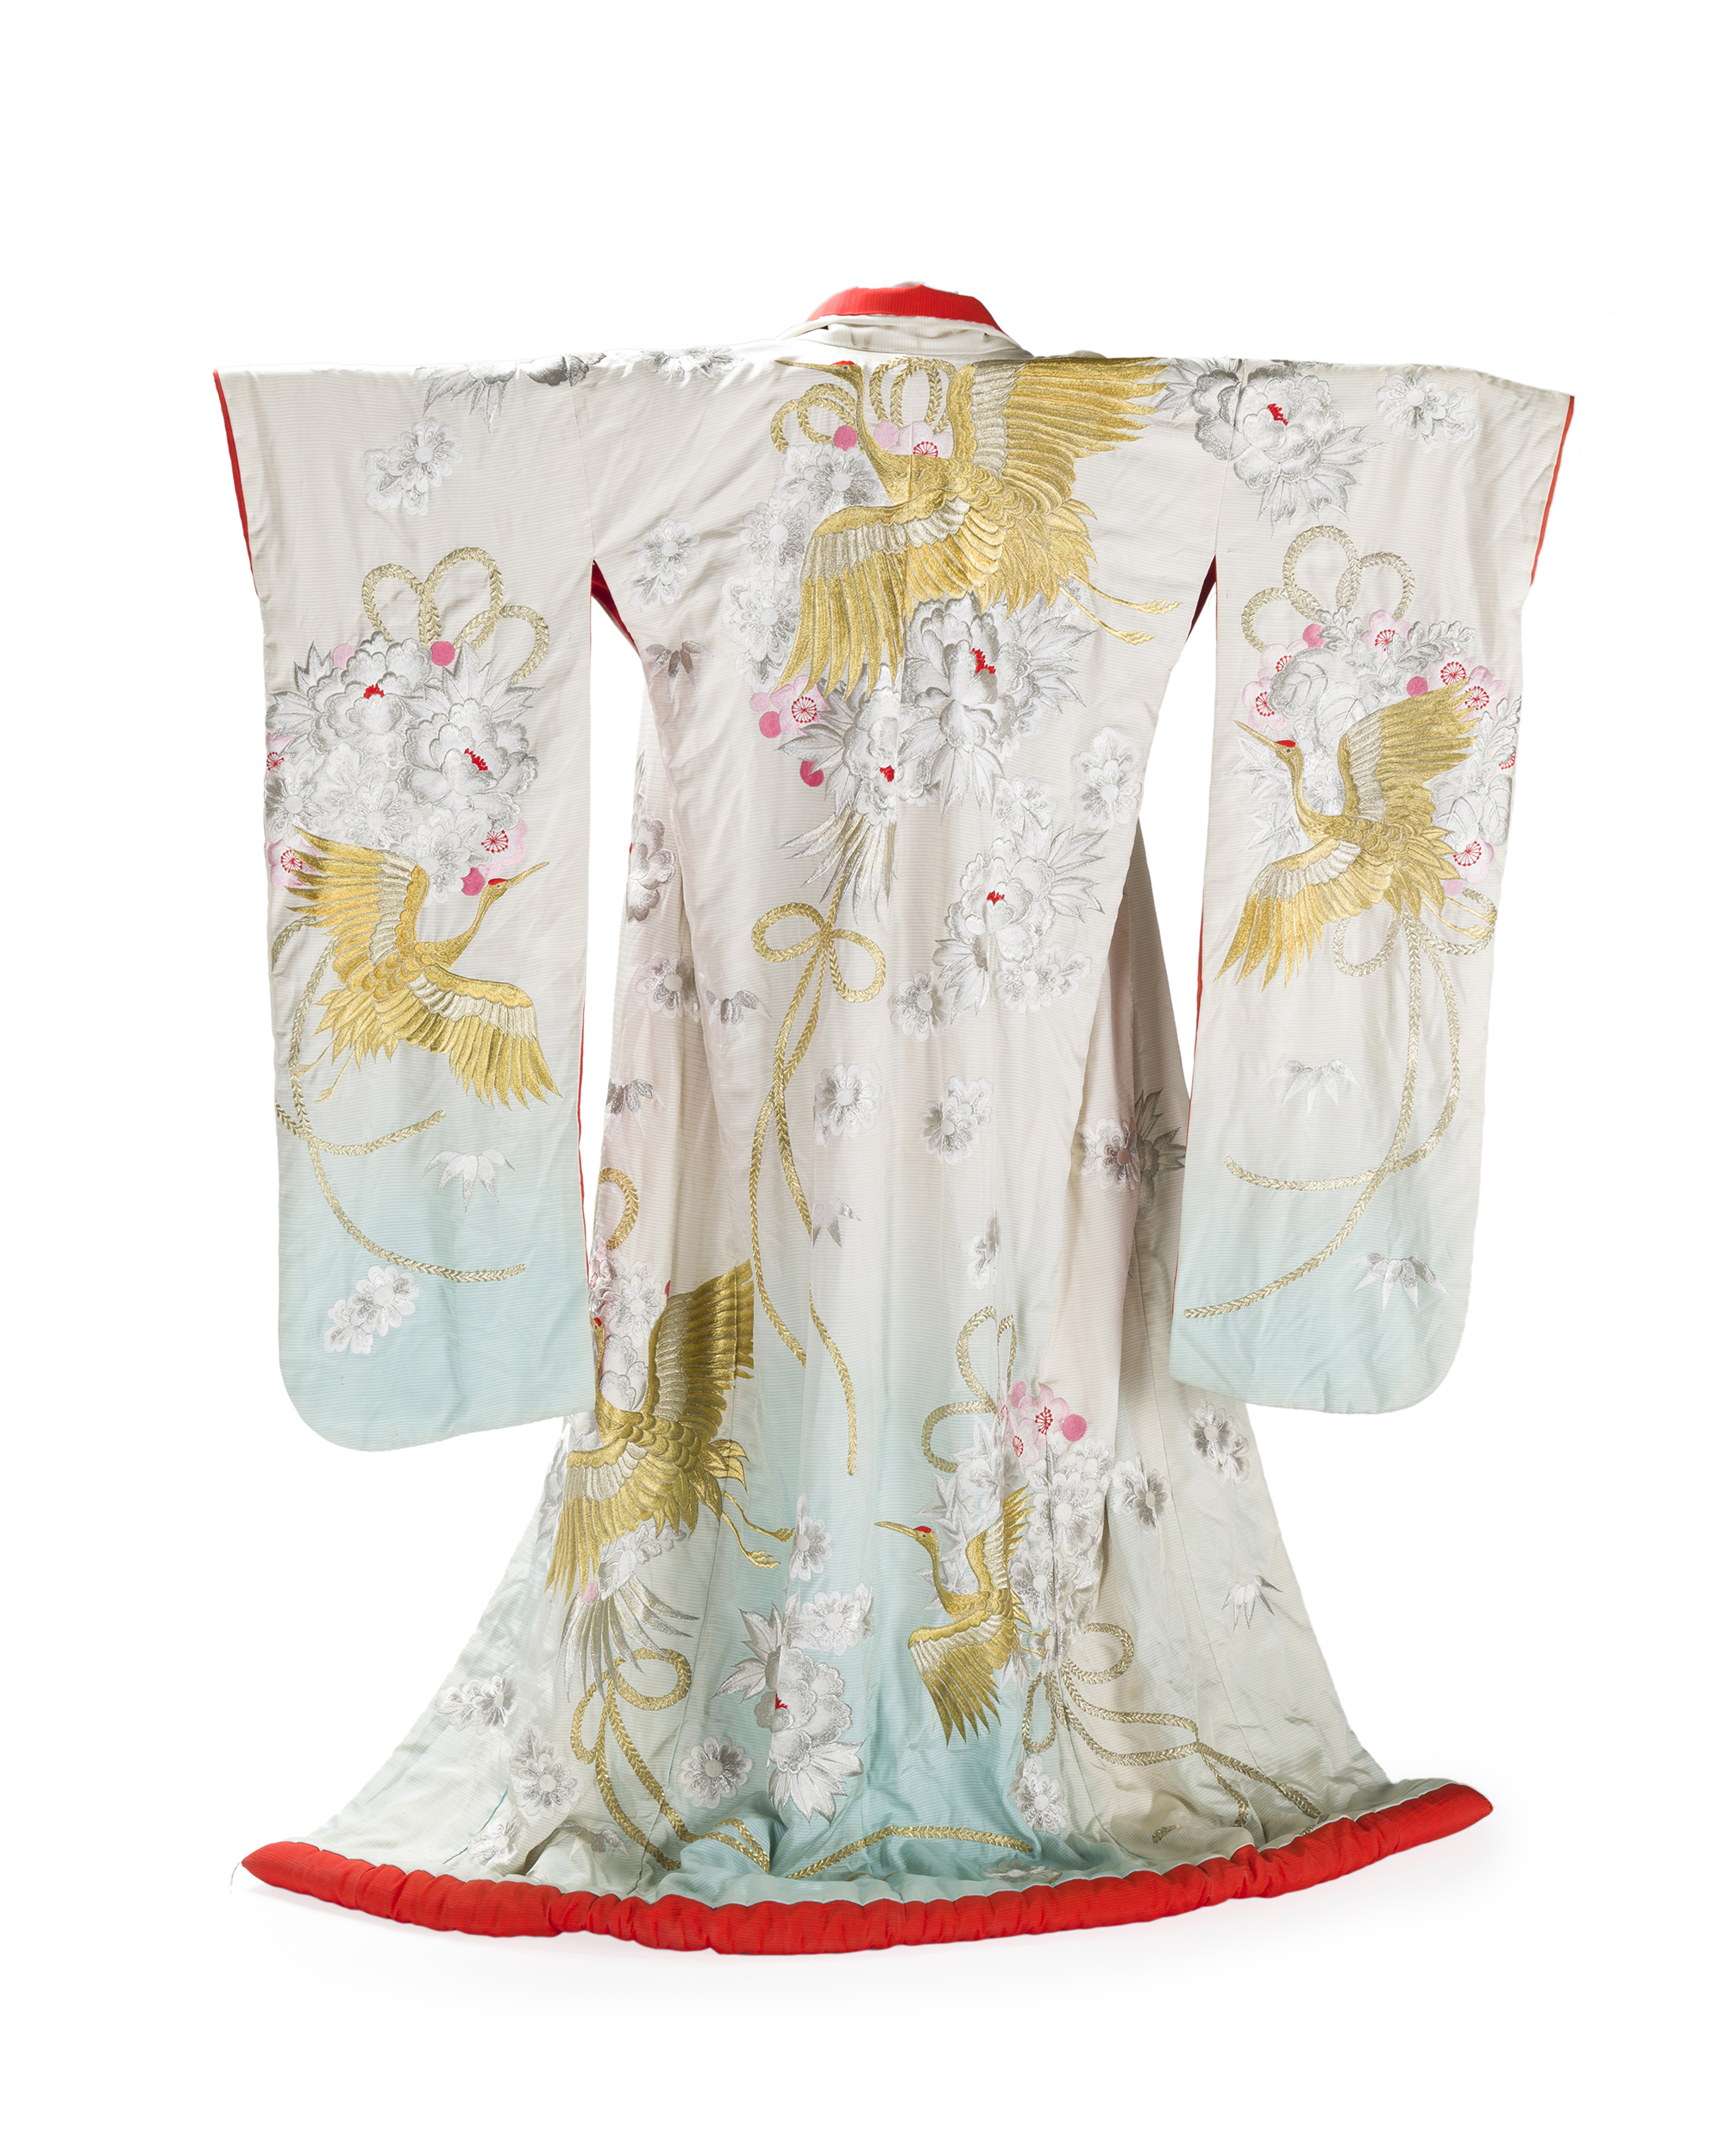 Lot 21 - A Japanese wedding kimono